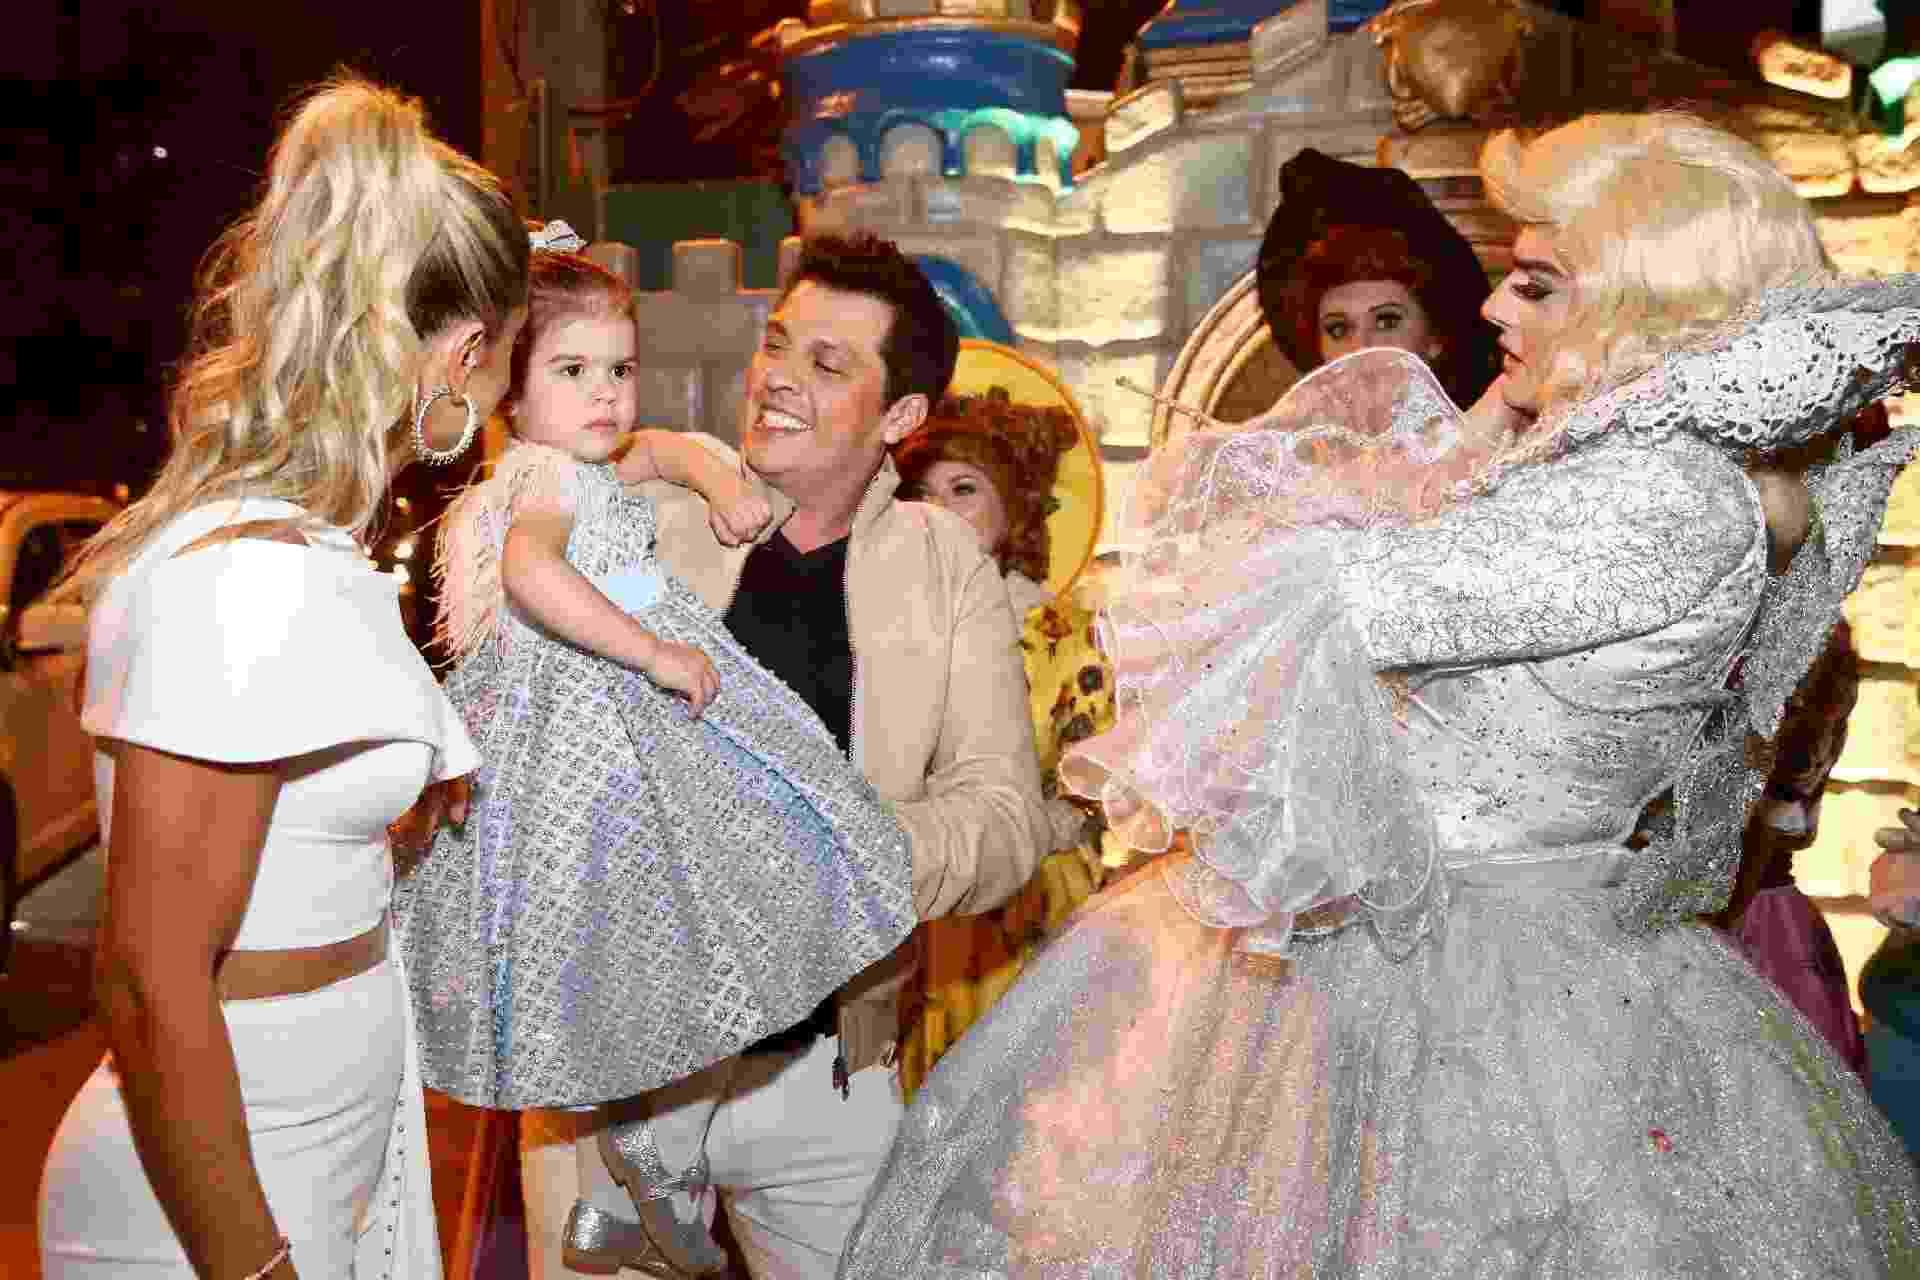 Mirella Santos e Wellington Muniz, o Ceará, promoveram na tarde desta sexta-feira (11) a festa de aniversário da filha, a pequena Valentina Santos Muniz. - Manuela Scarpa/Brazil News